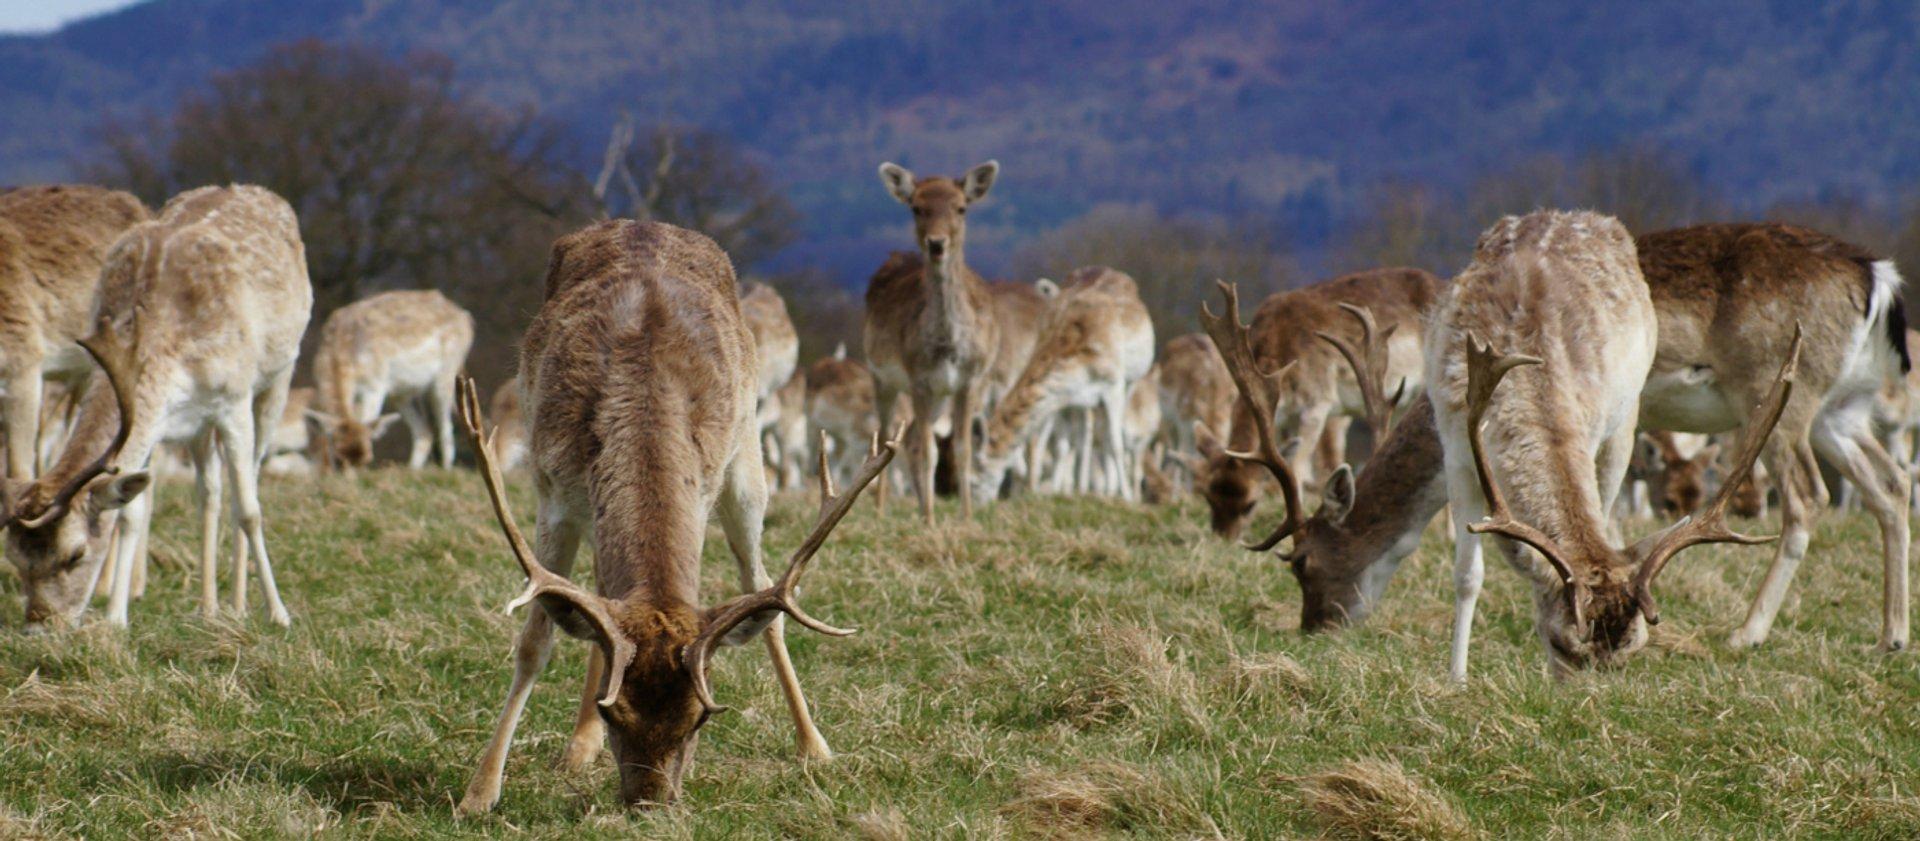 deer park at attingham.jpg